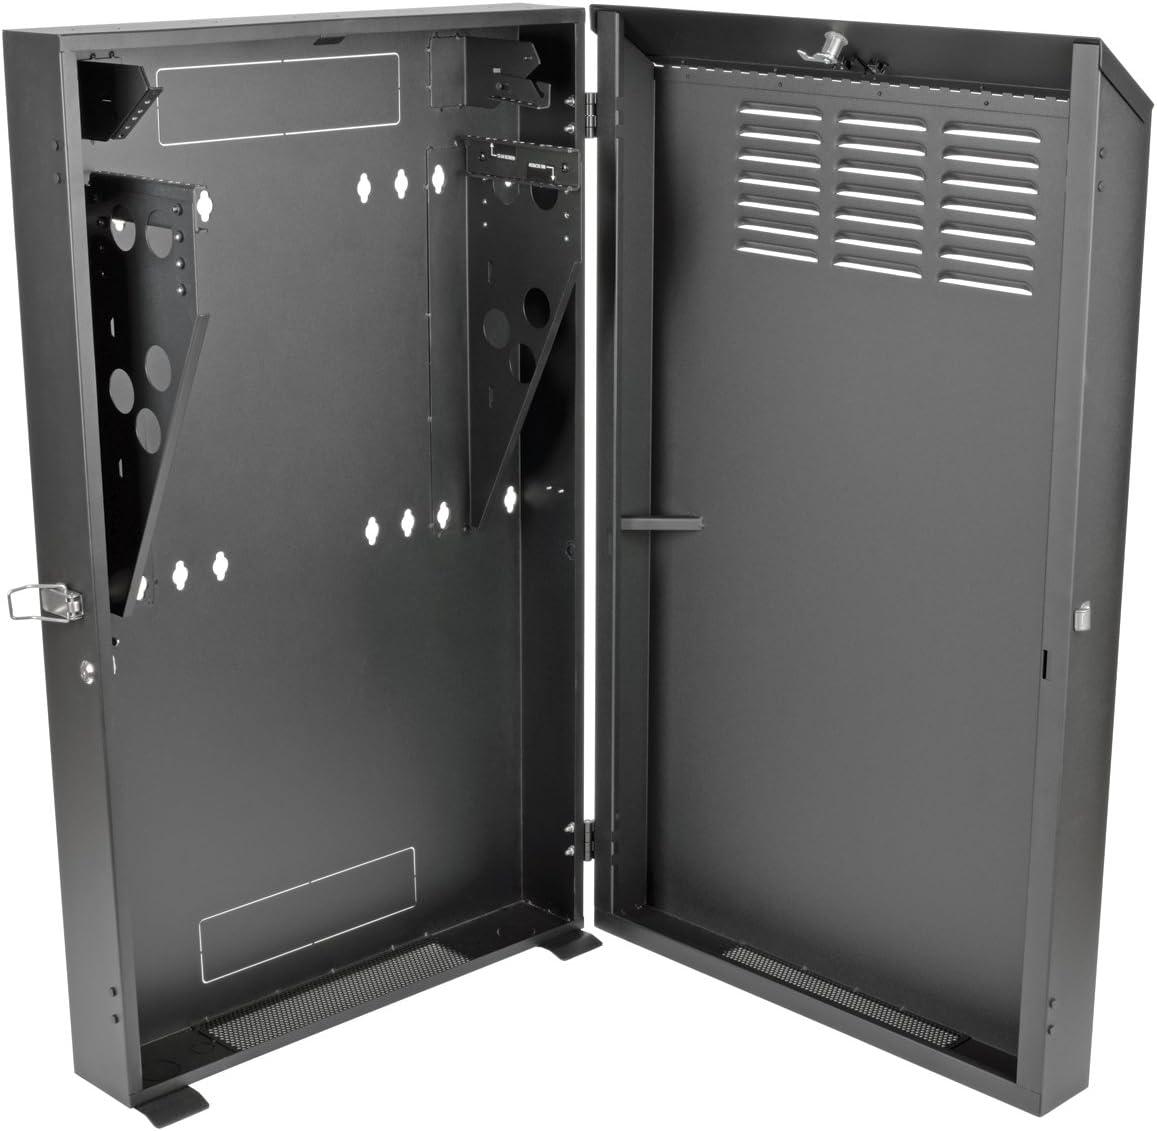 Tripp Lite 4U Vertical Wall Mount Rack Enclosure Cabinet, Low Profile, Server Depth, 36